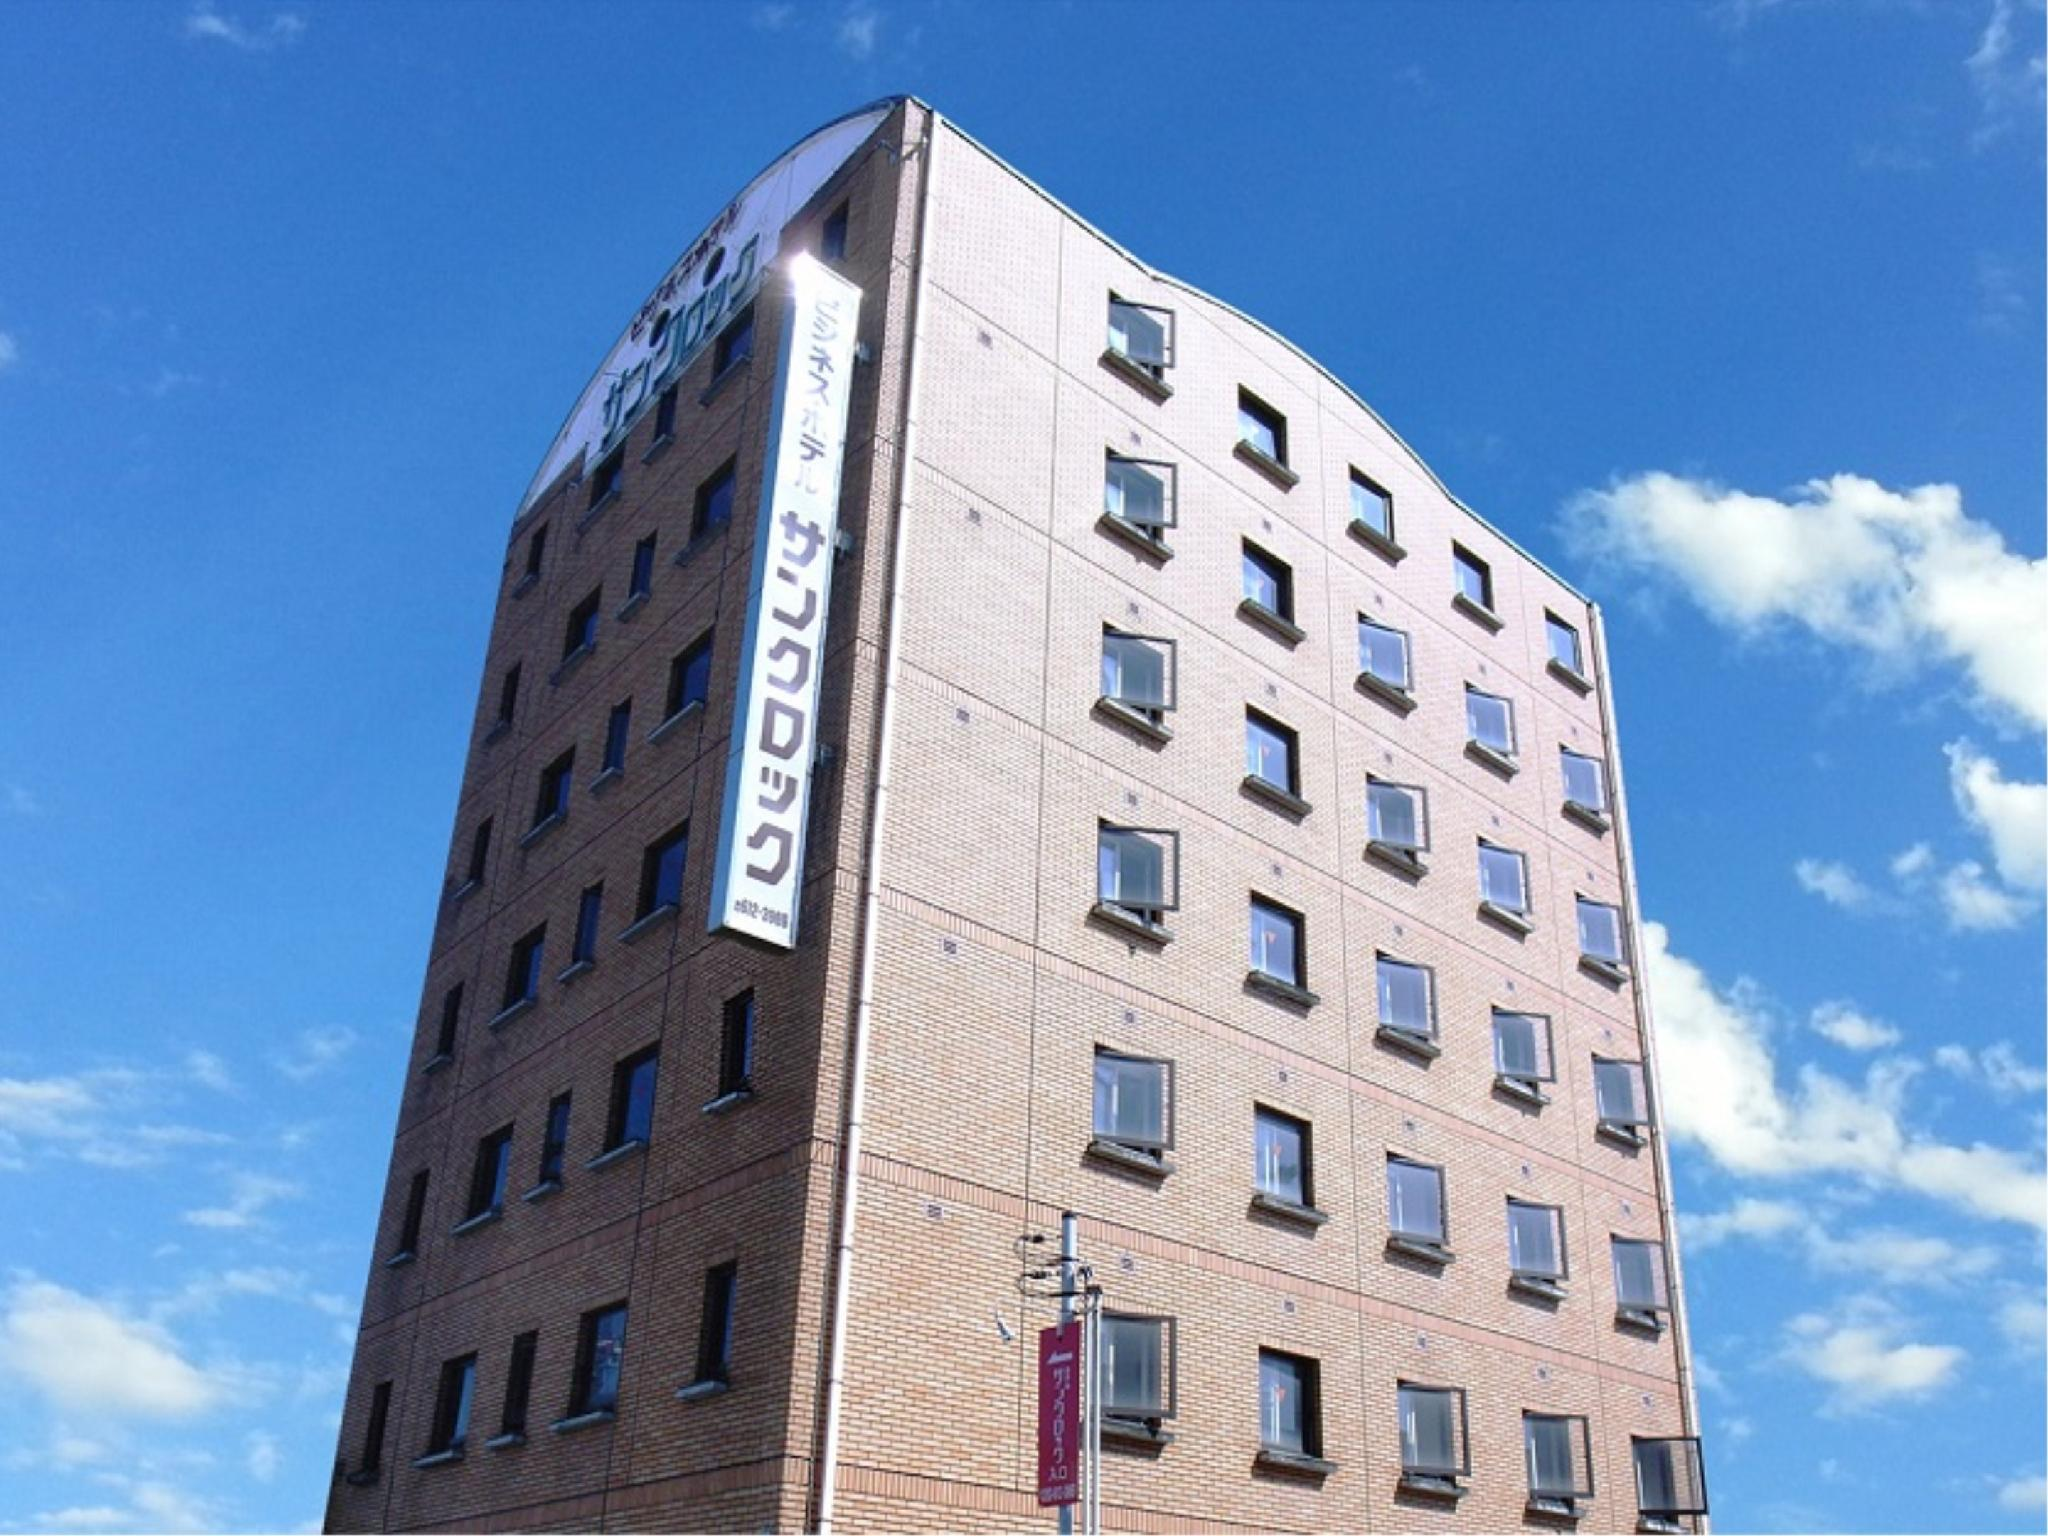 Business Hotel Sunclock